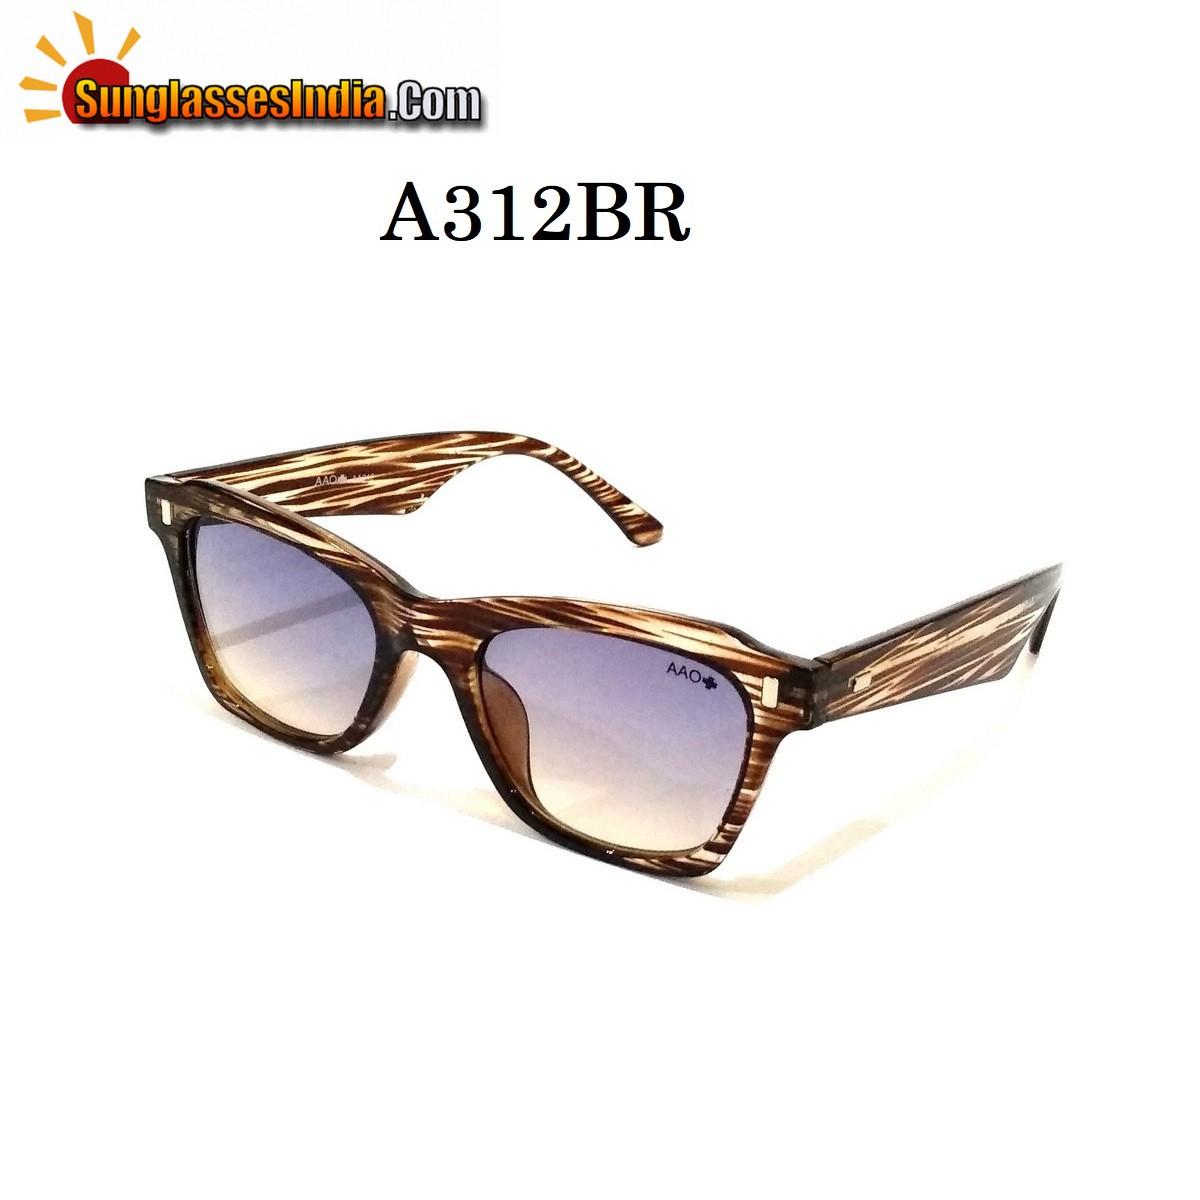 Brown Wayfare Sunglasses A312BR